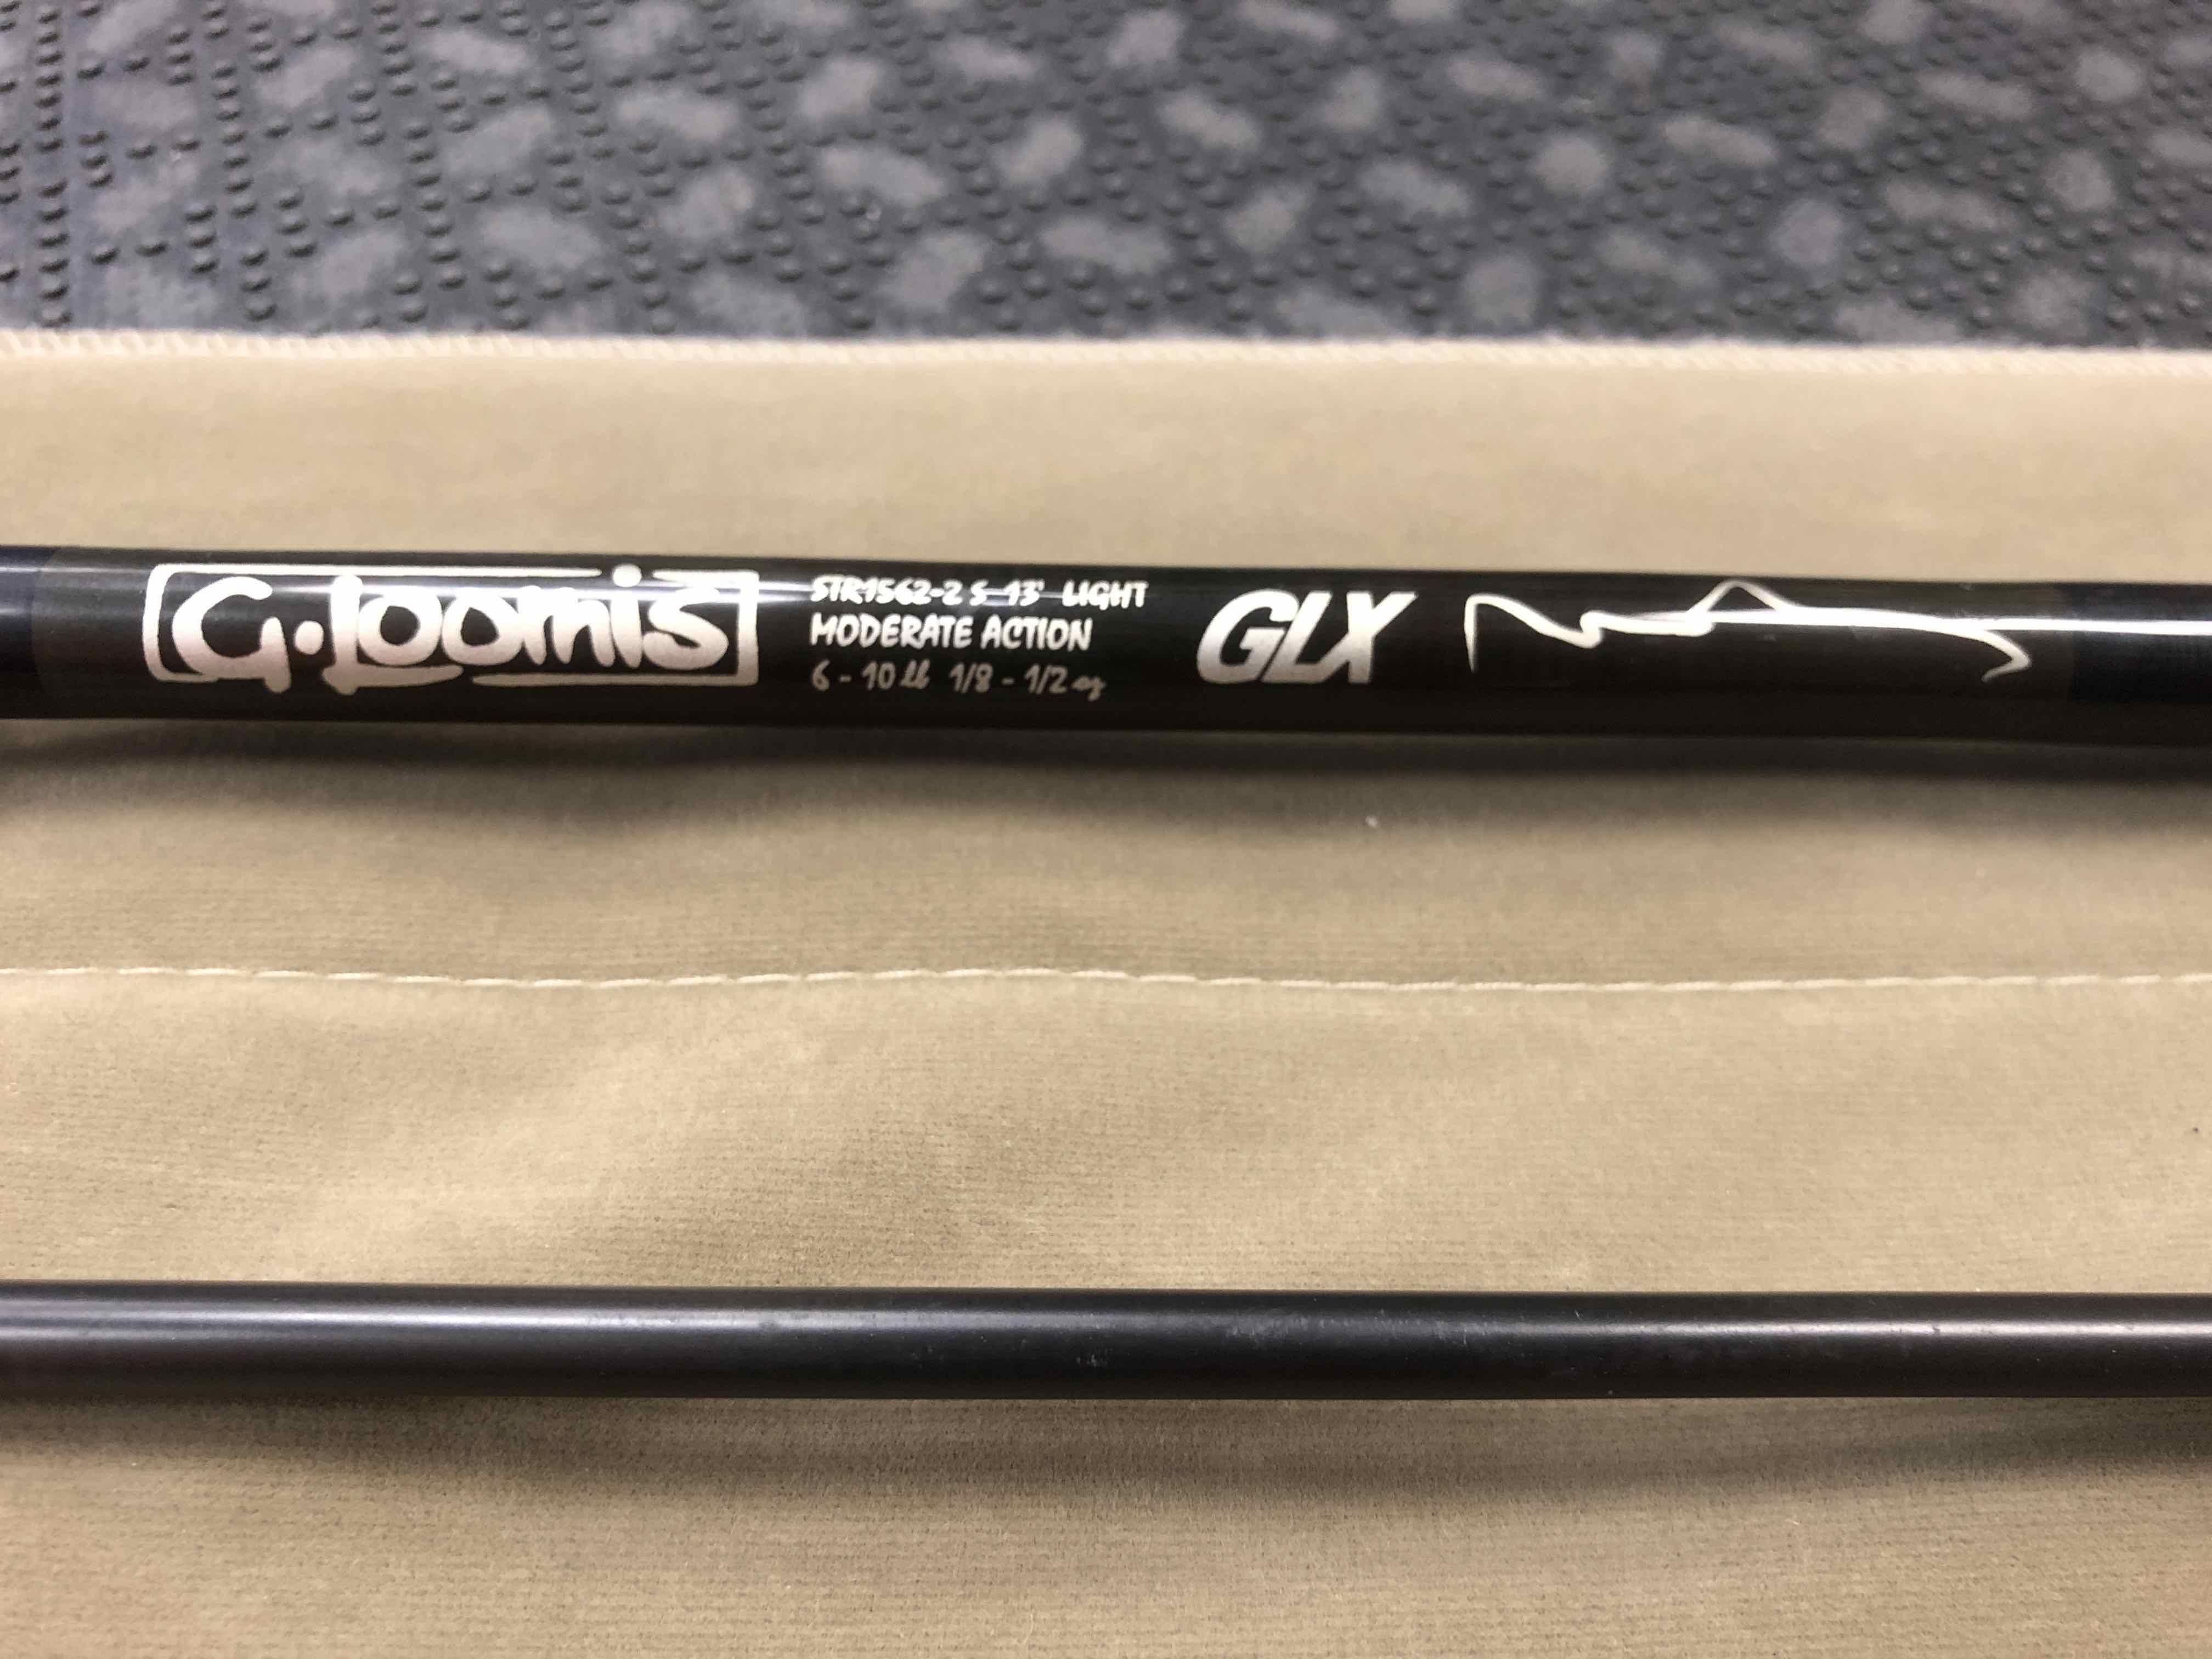 G. Loomis Centerpin Float Rod - STR1562-2 Light - 2 Piece - GOOD SHAPE! - $400